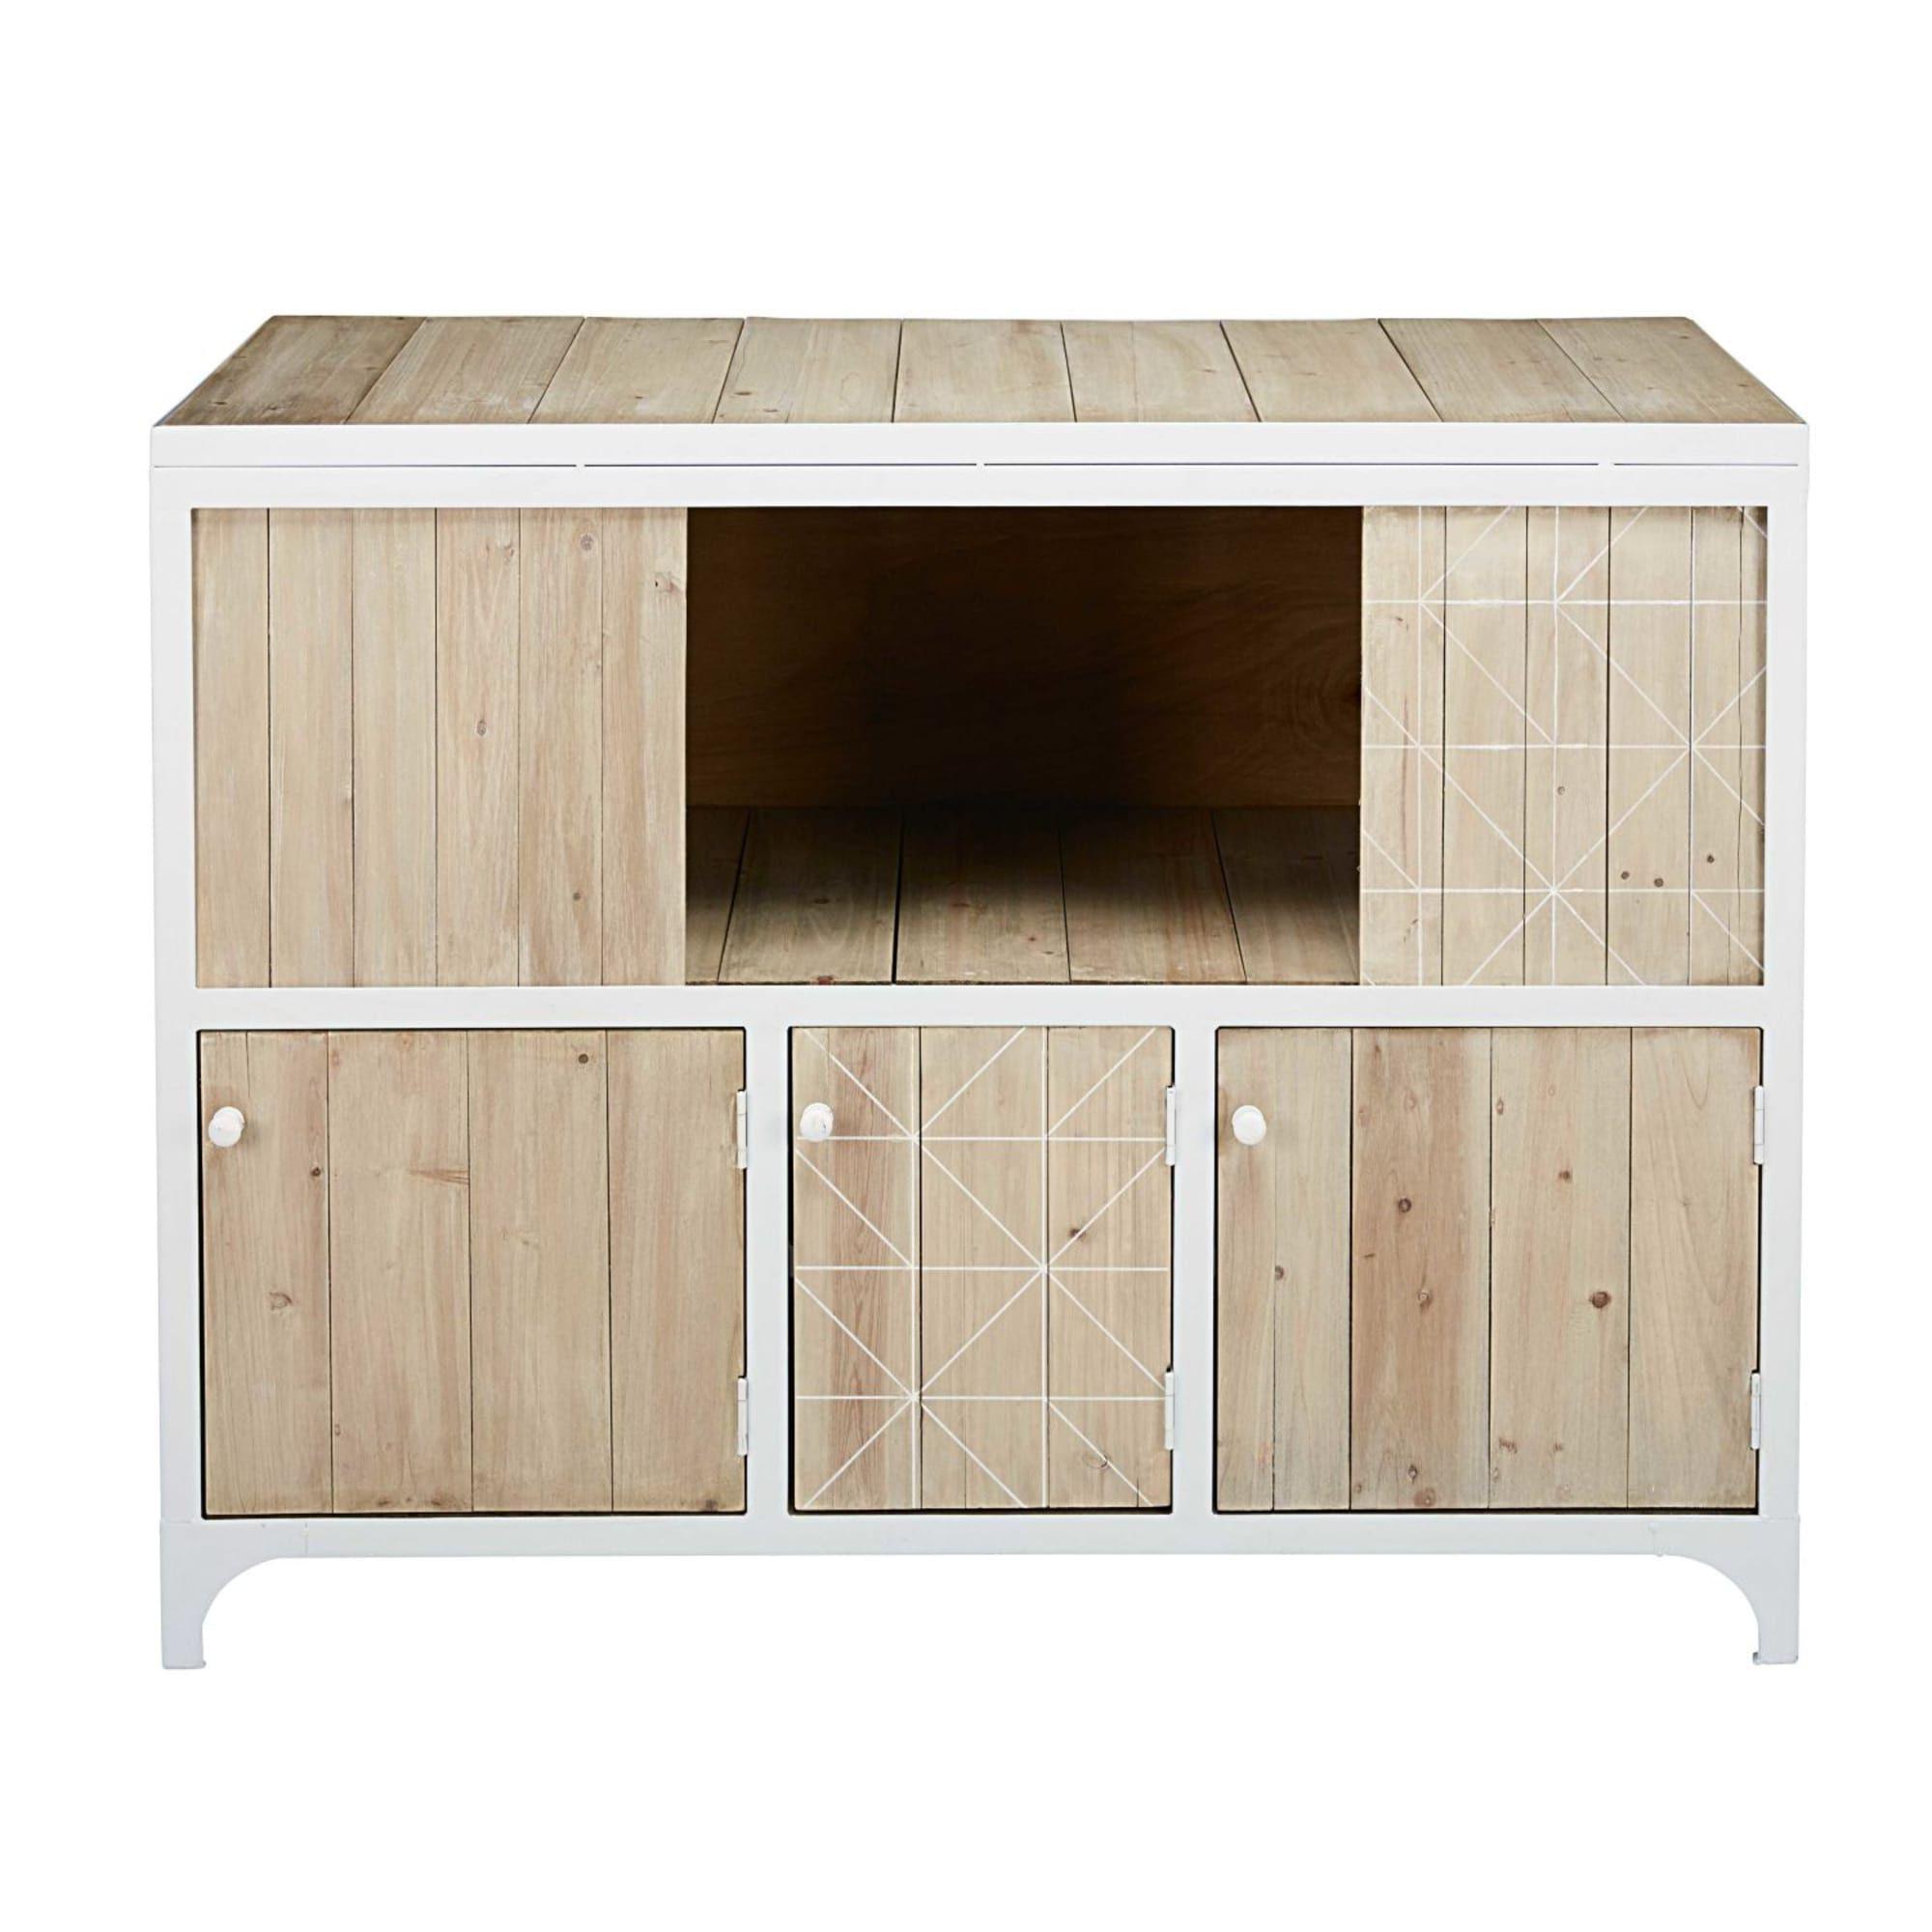 Aged Pine 3 Drawer 2 Door Sideboards Throughout Trendy White Metal And Pine 3 Door Sideboard In  (View 4 of 20)